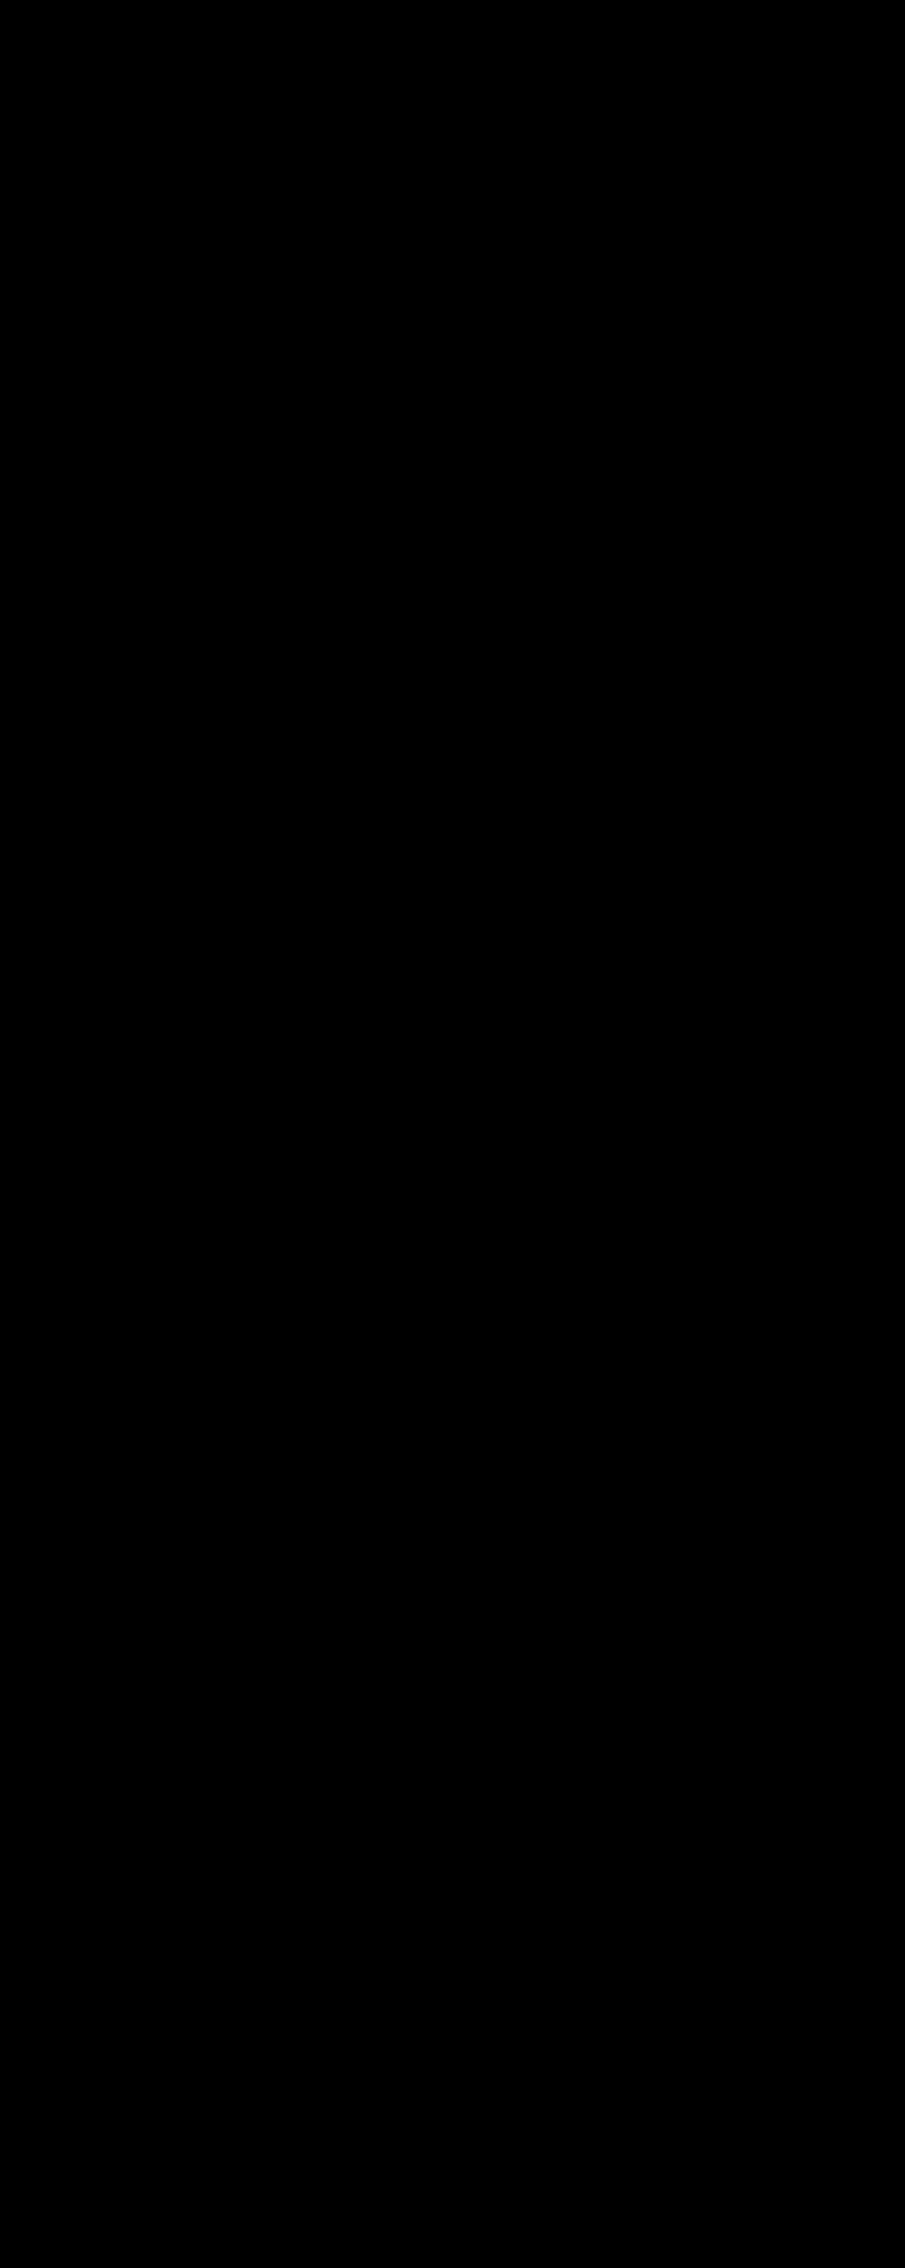 Violin clip art at. Syringe clipart silhouette